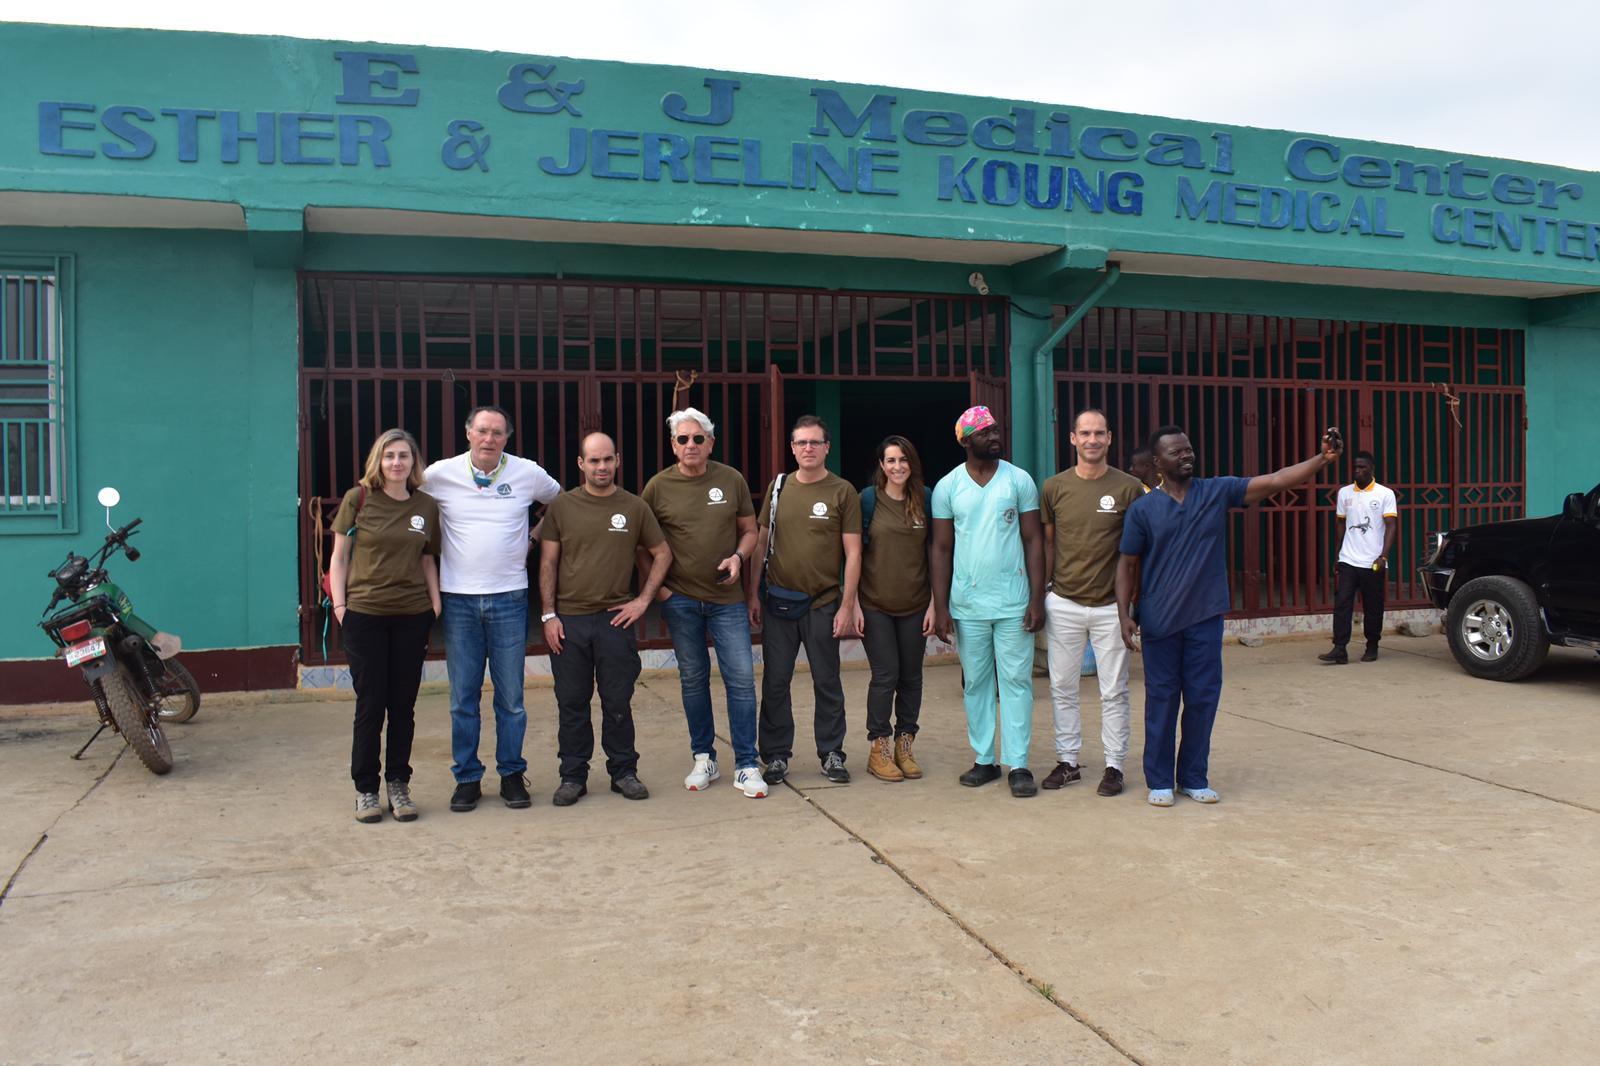 Promesa Cumplida: Equipo Bisturí Solidario en la puerta del hospital de Ganta City